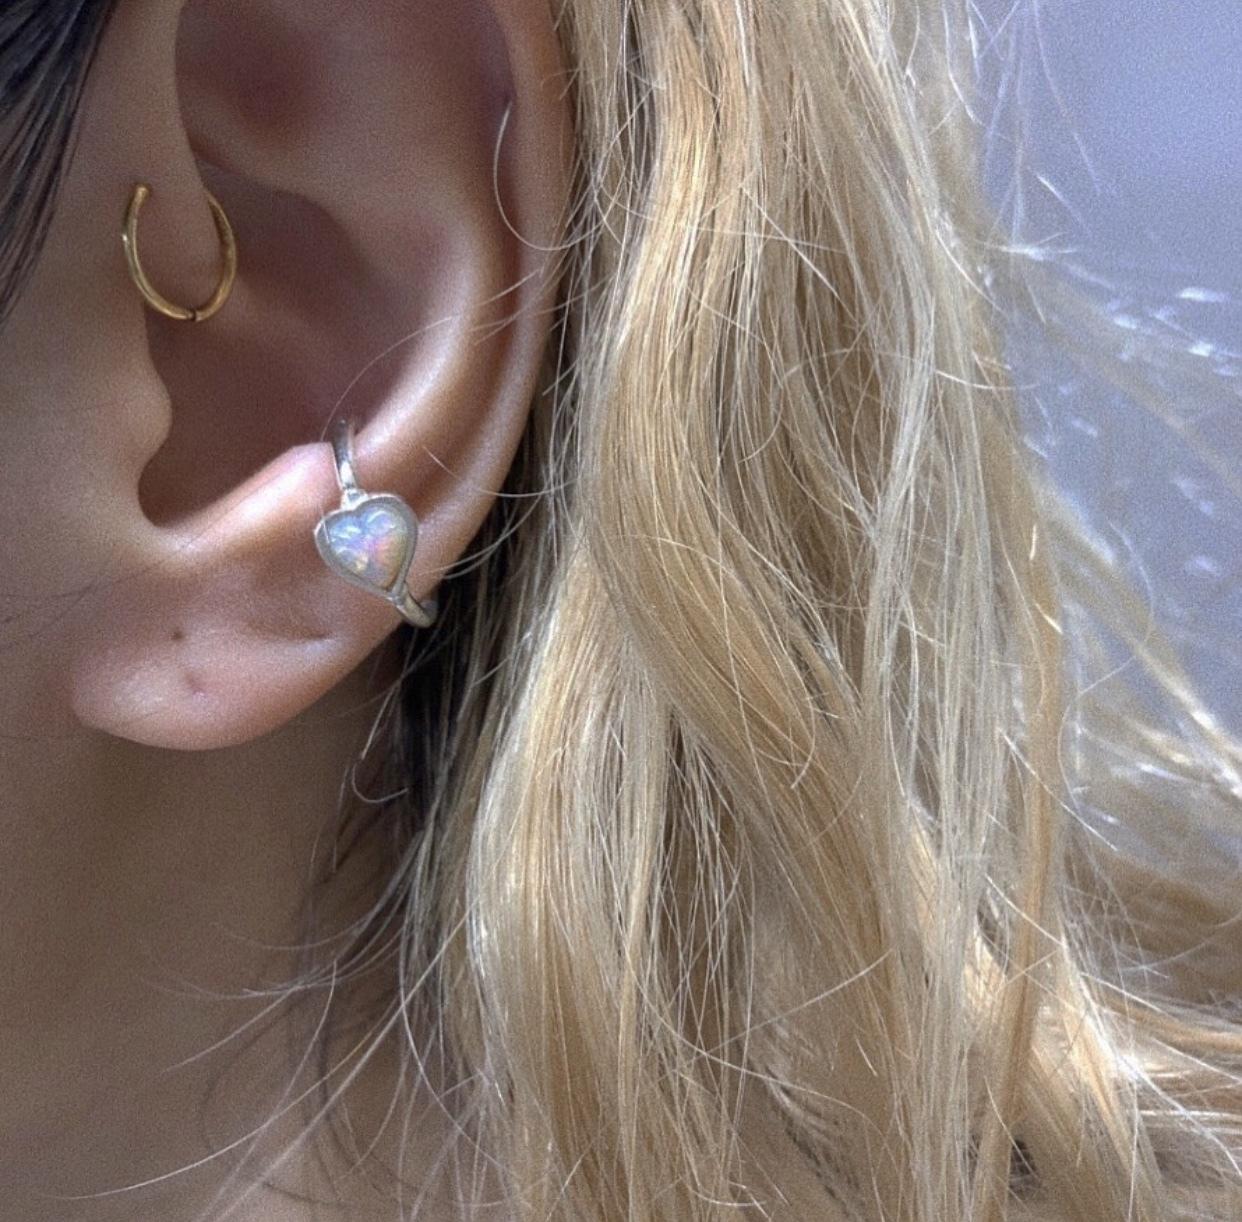 Vintage Heart Stone の snap RING body jewelry 縦 チャーム単体 SILVER925 #LJ19034P